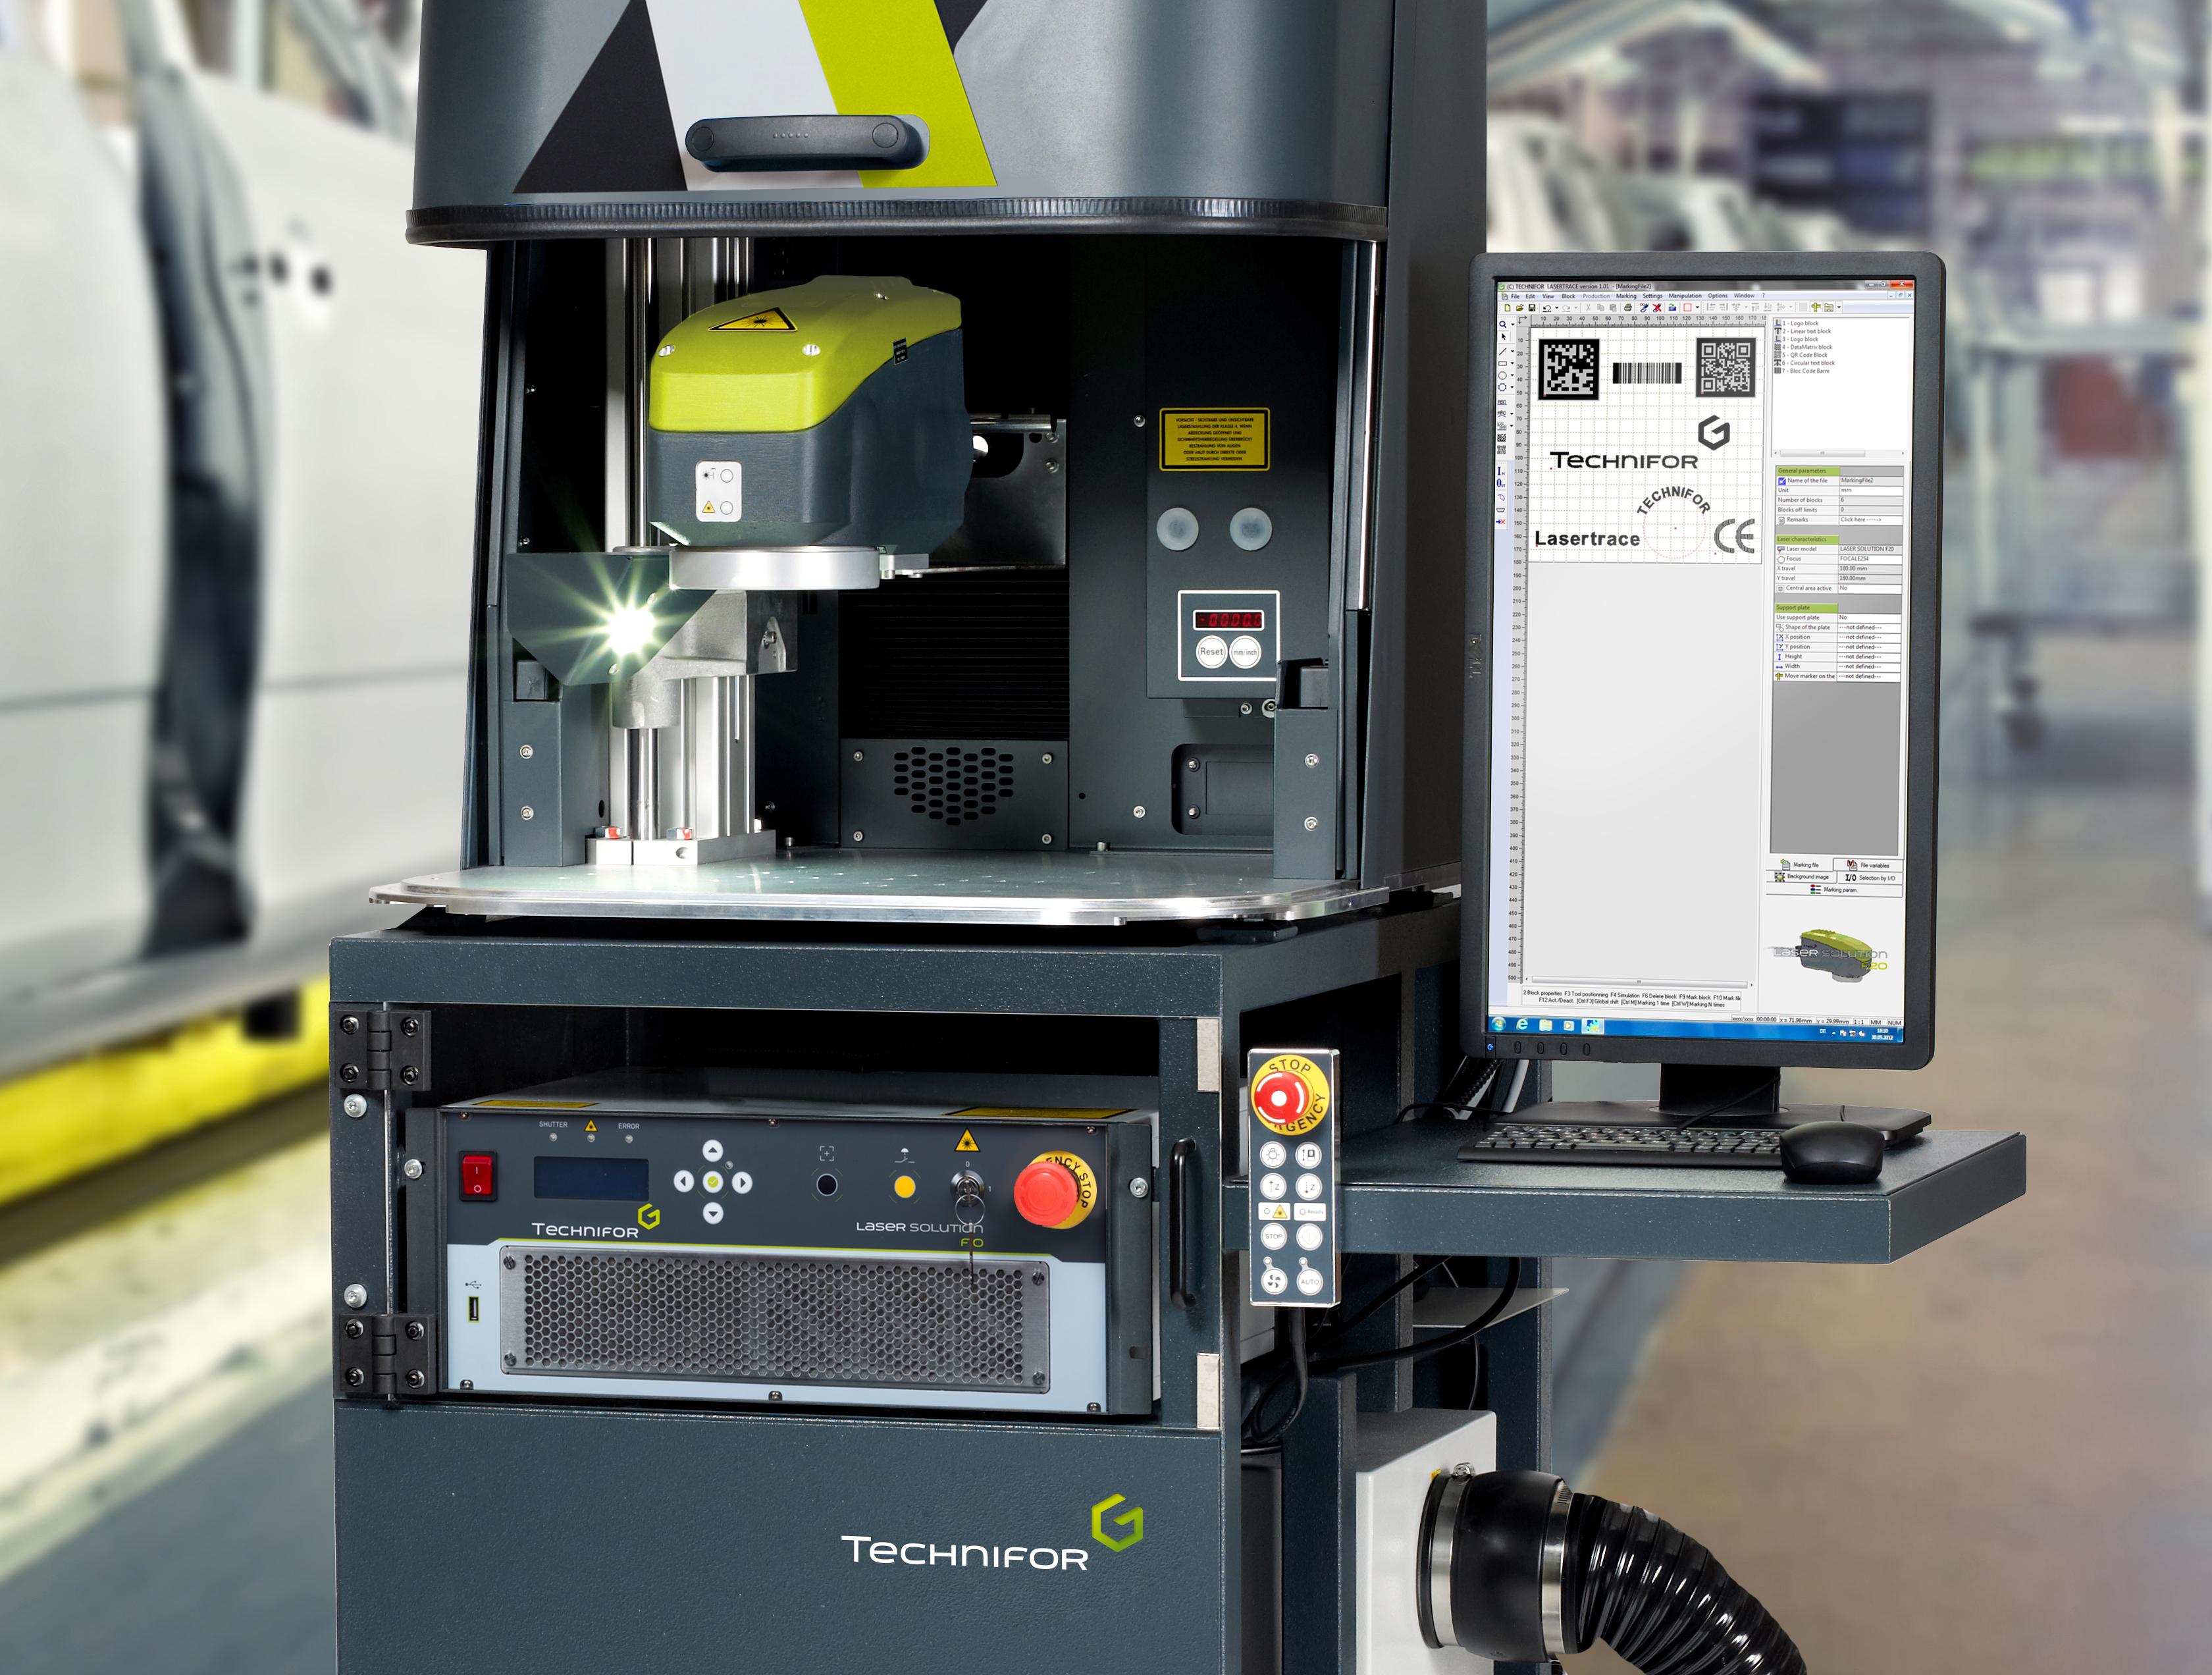 Technifor Fiber Laser Series